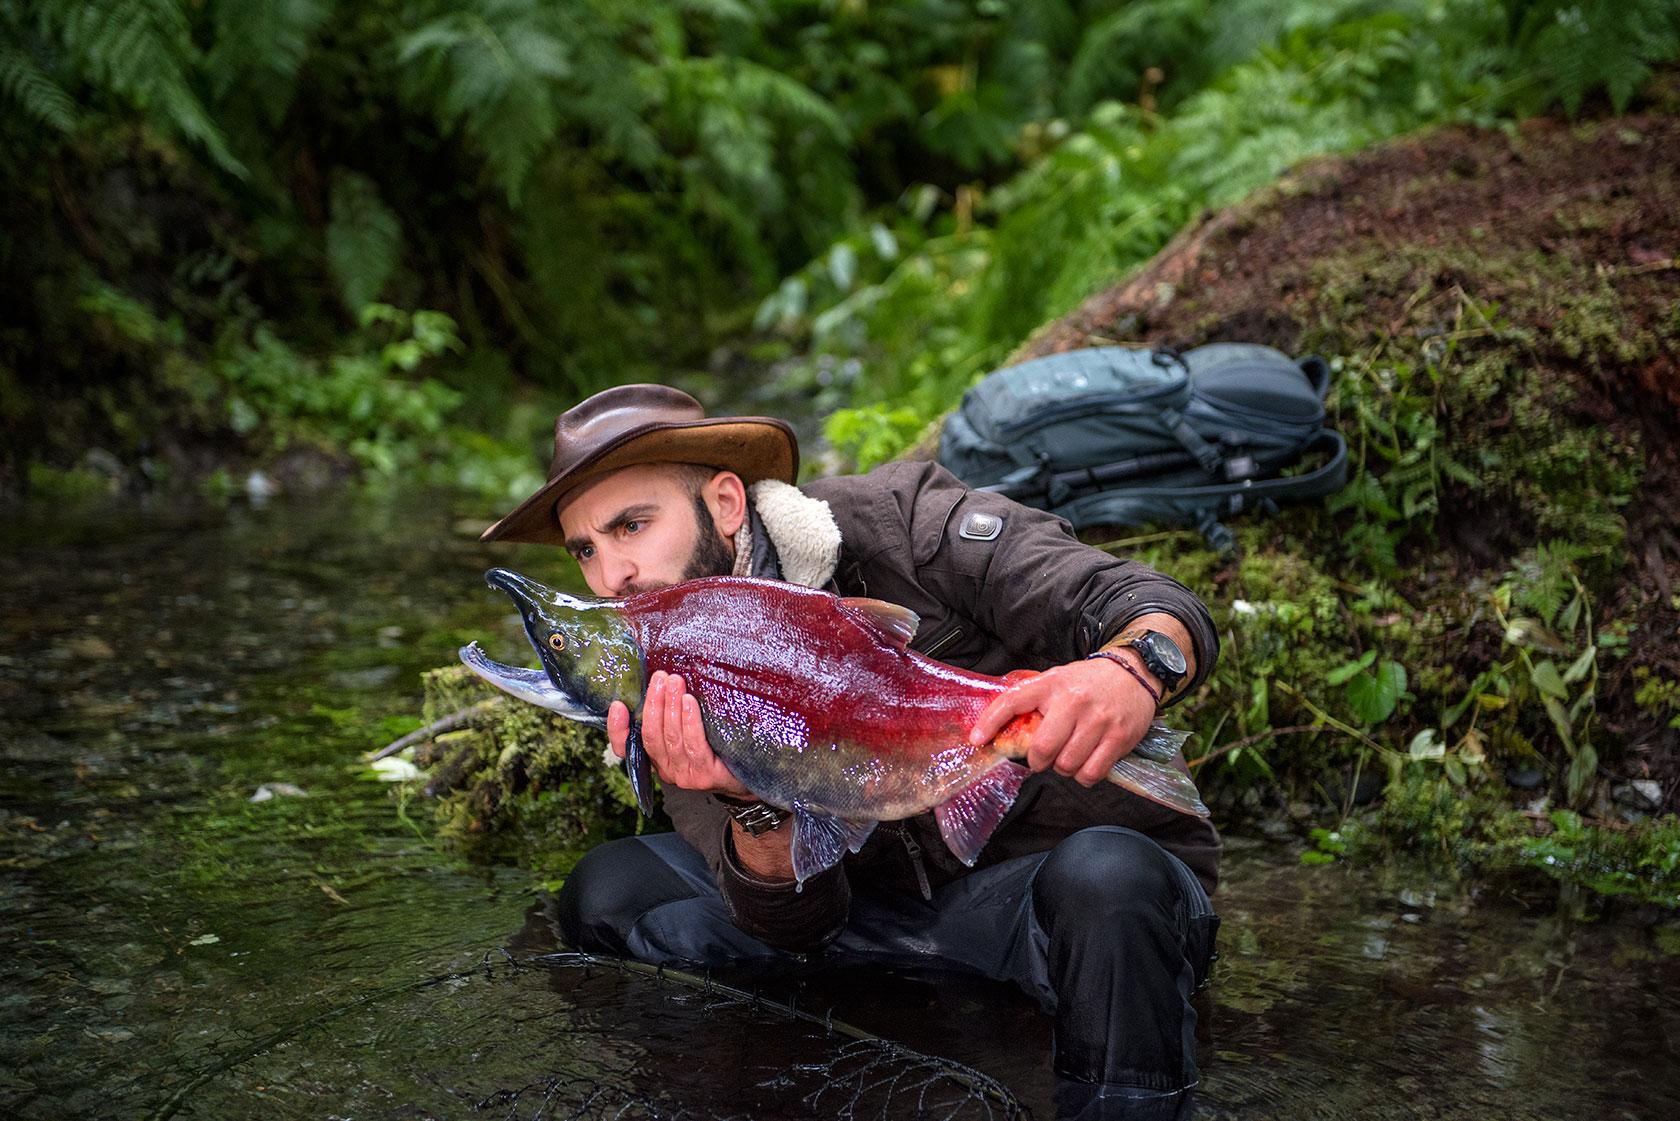 austin-trigg-brave-wilderness-alaska-BW-Coyote-Examines-Salmon.jpg